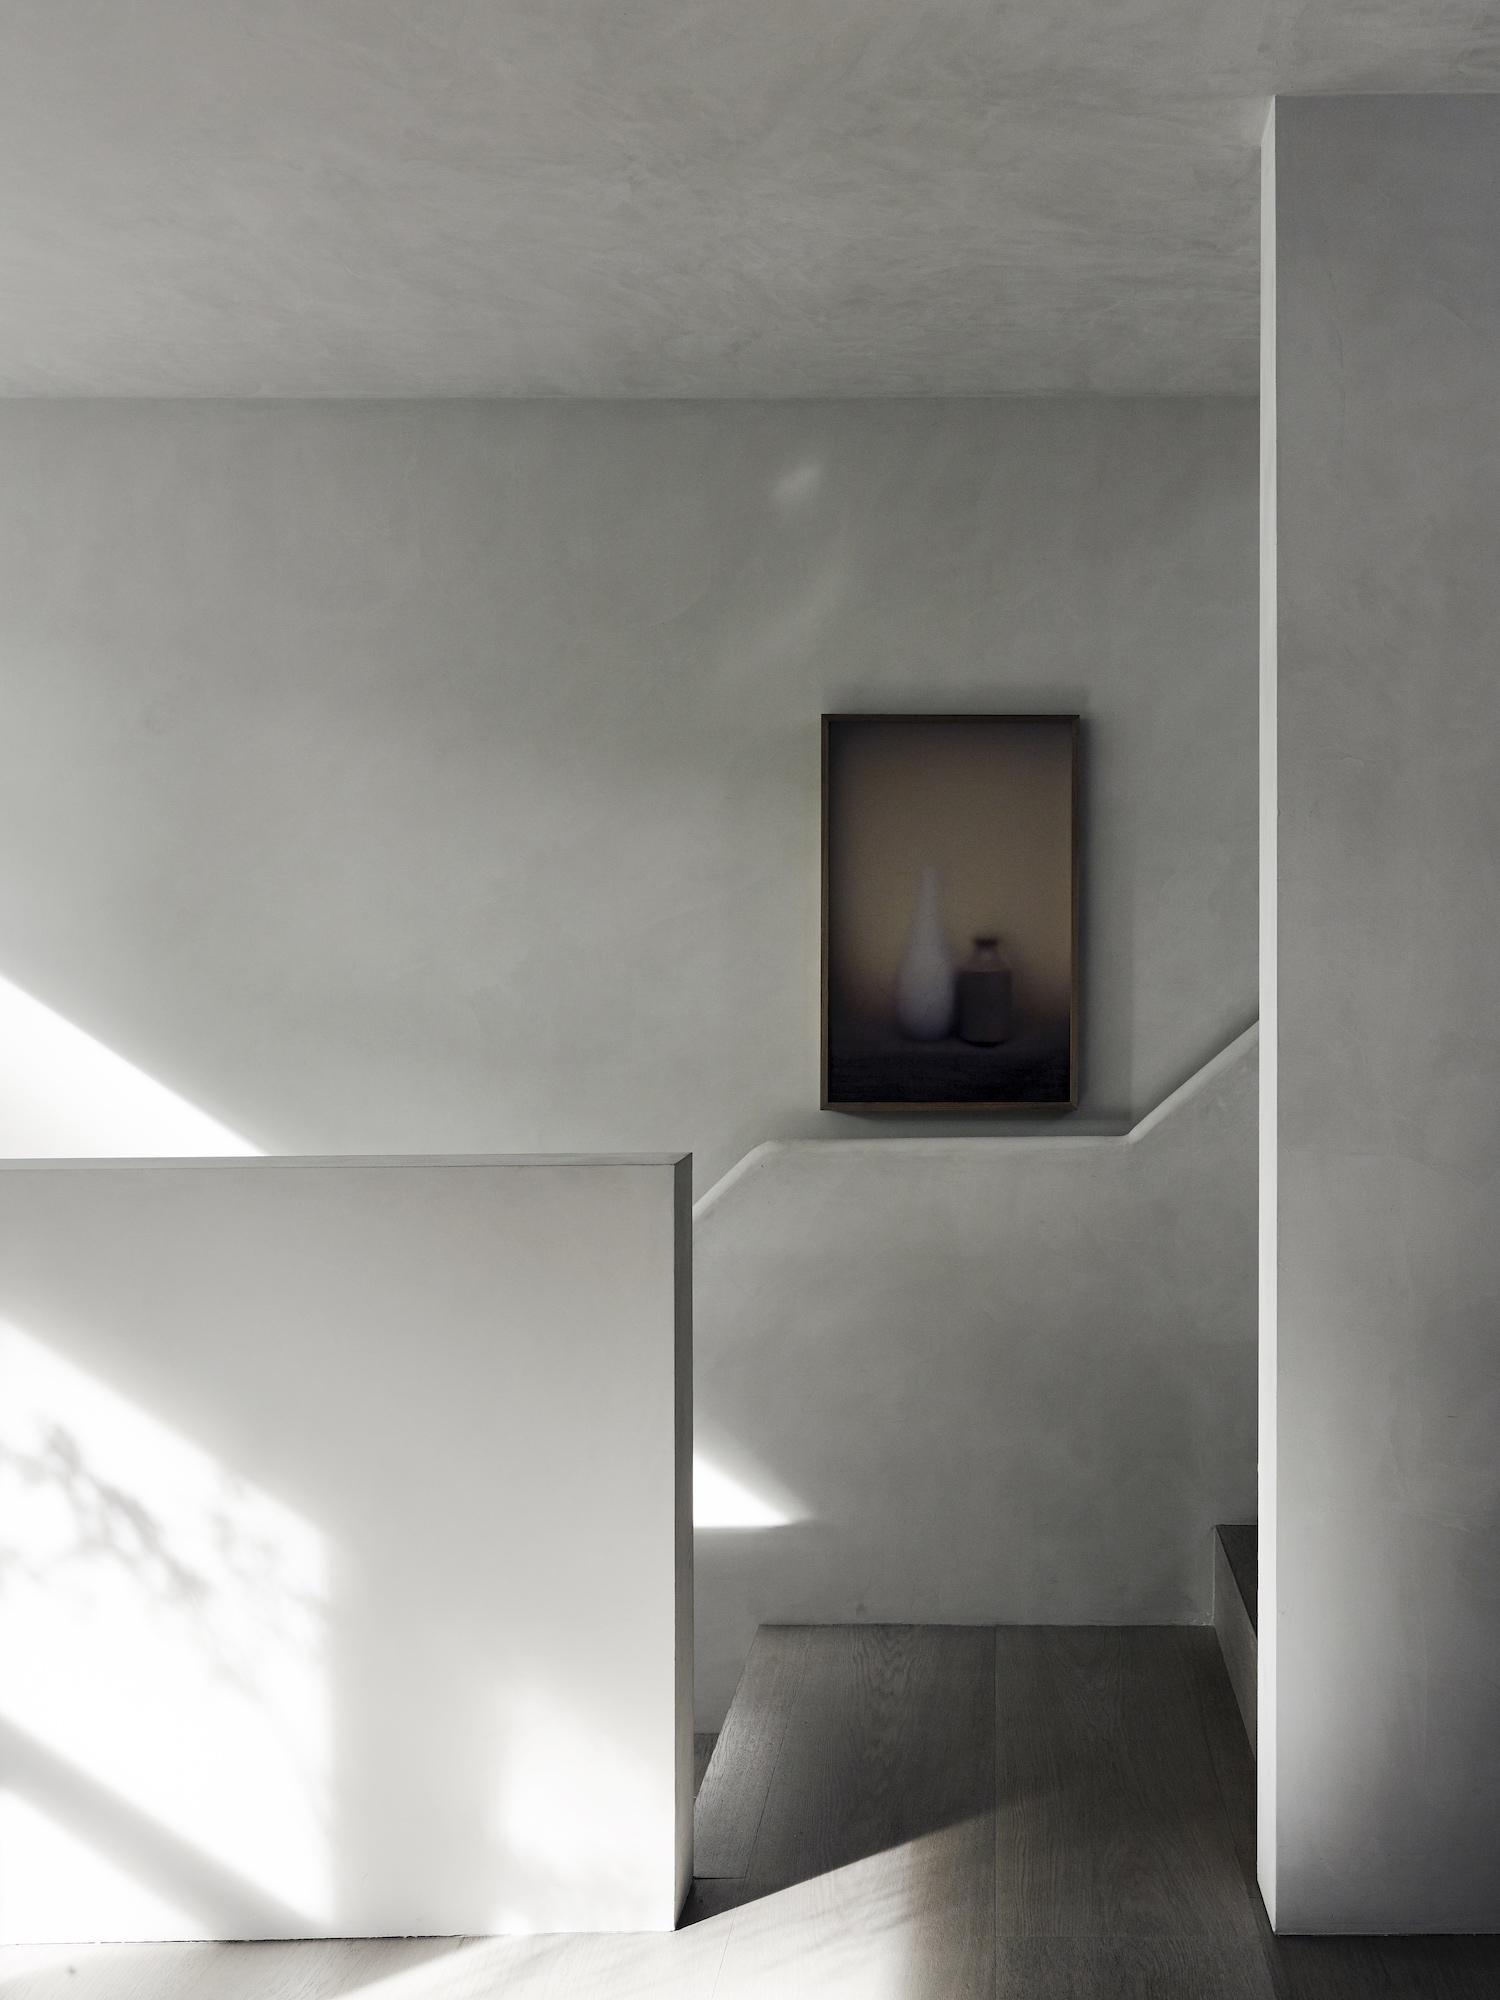 est living amsterdam residence studio piet boon 04